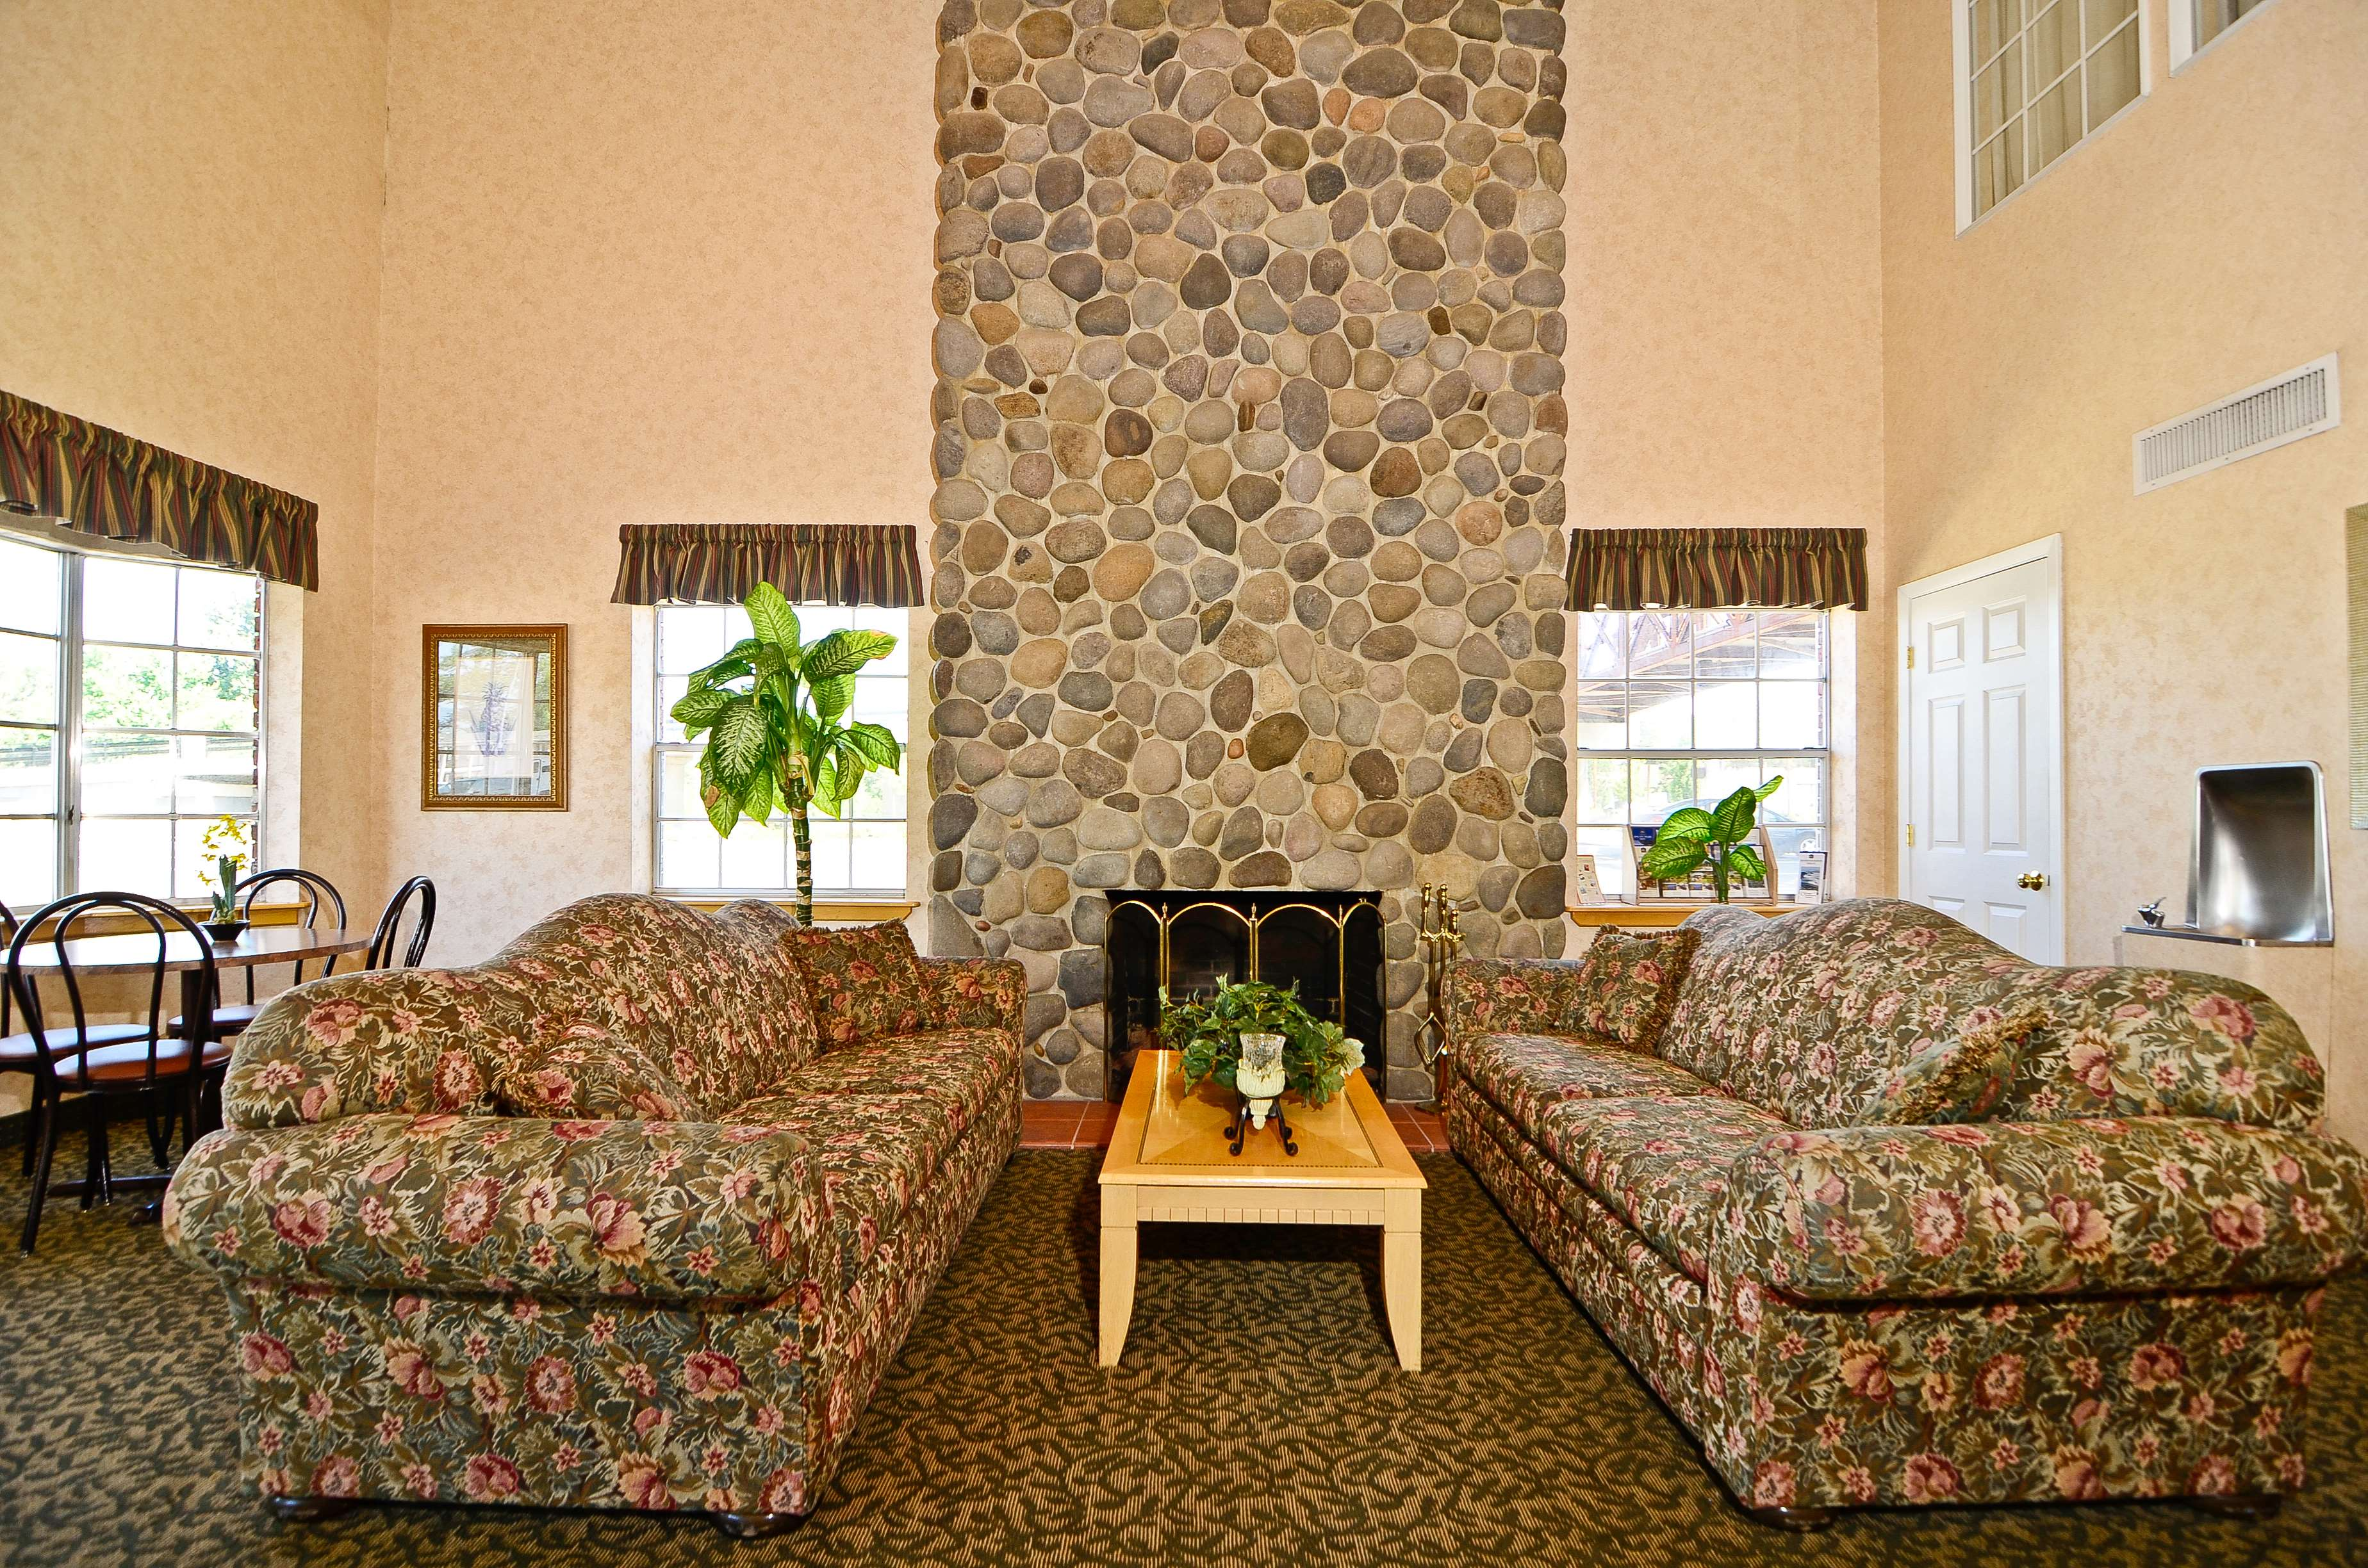 Best Western Horizon Inn image 39